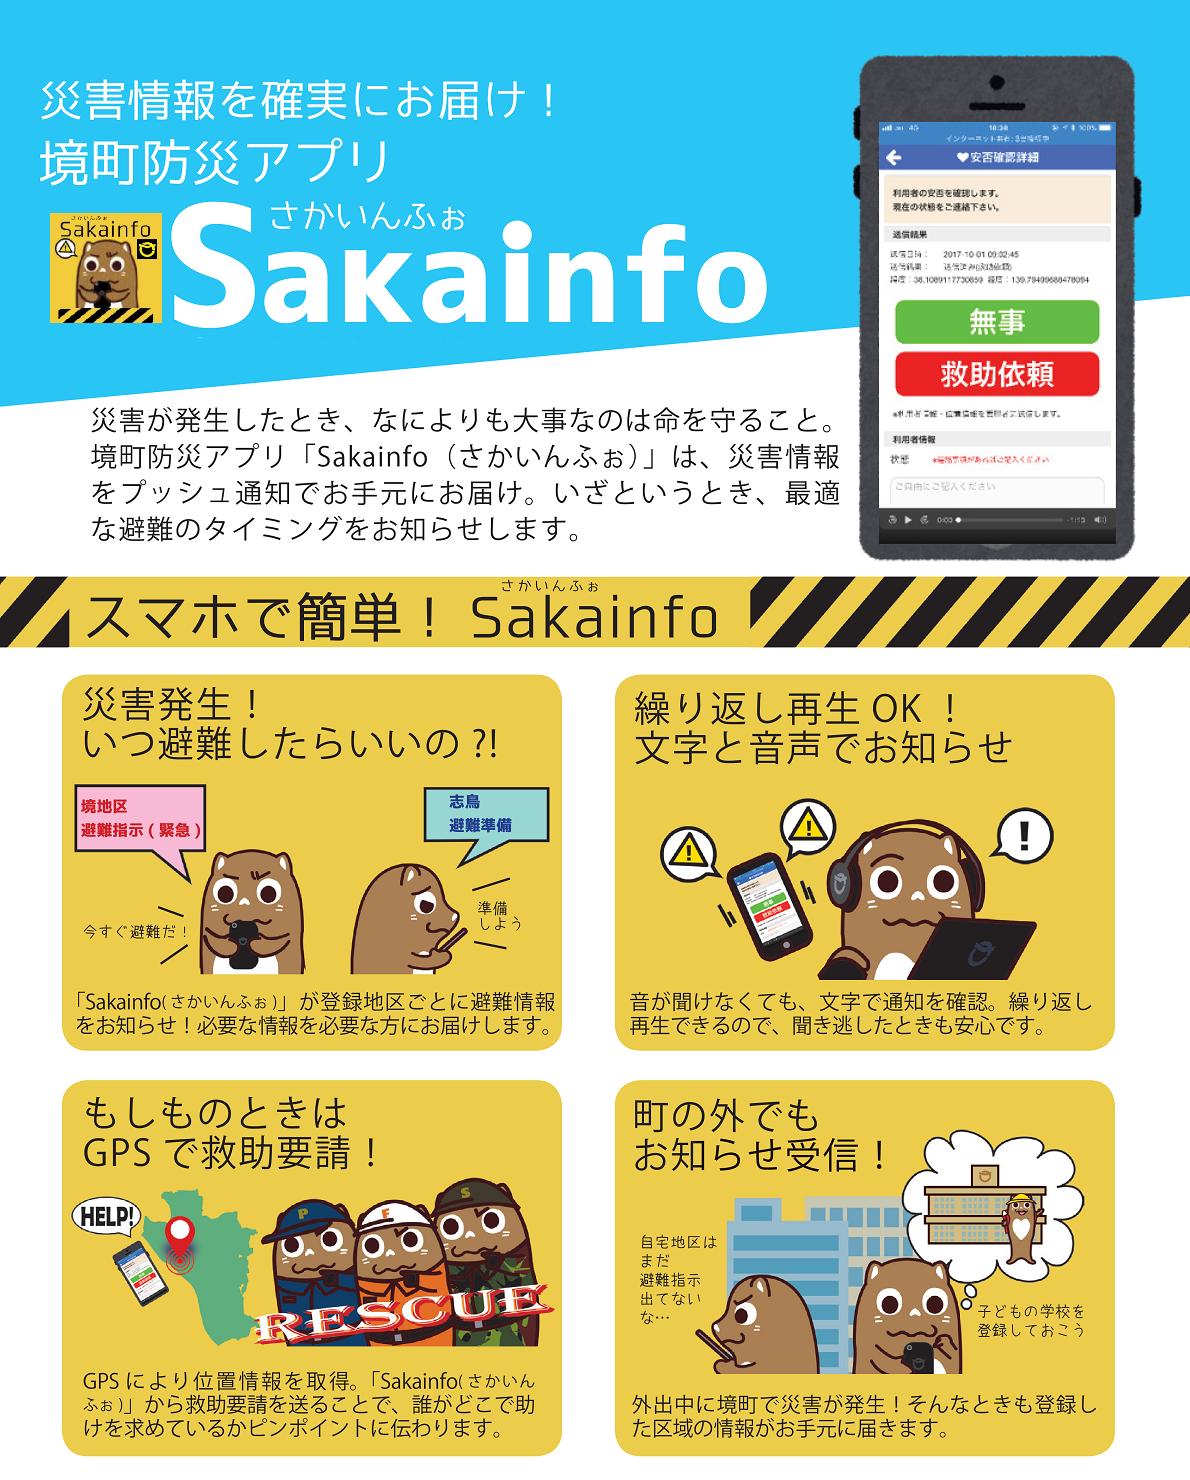 『Sakainfo_ちらし』の画像